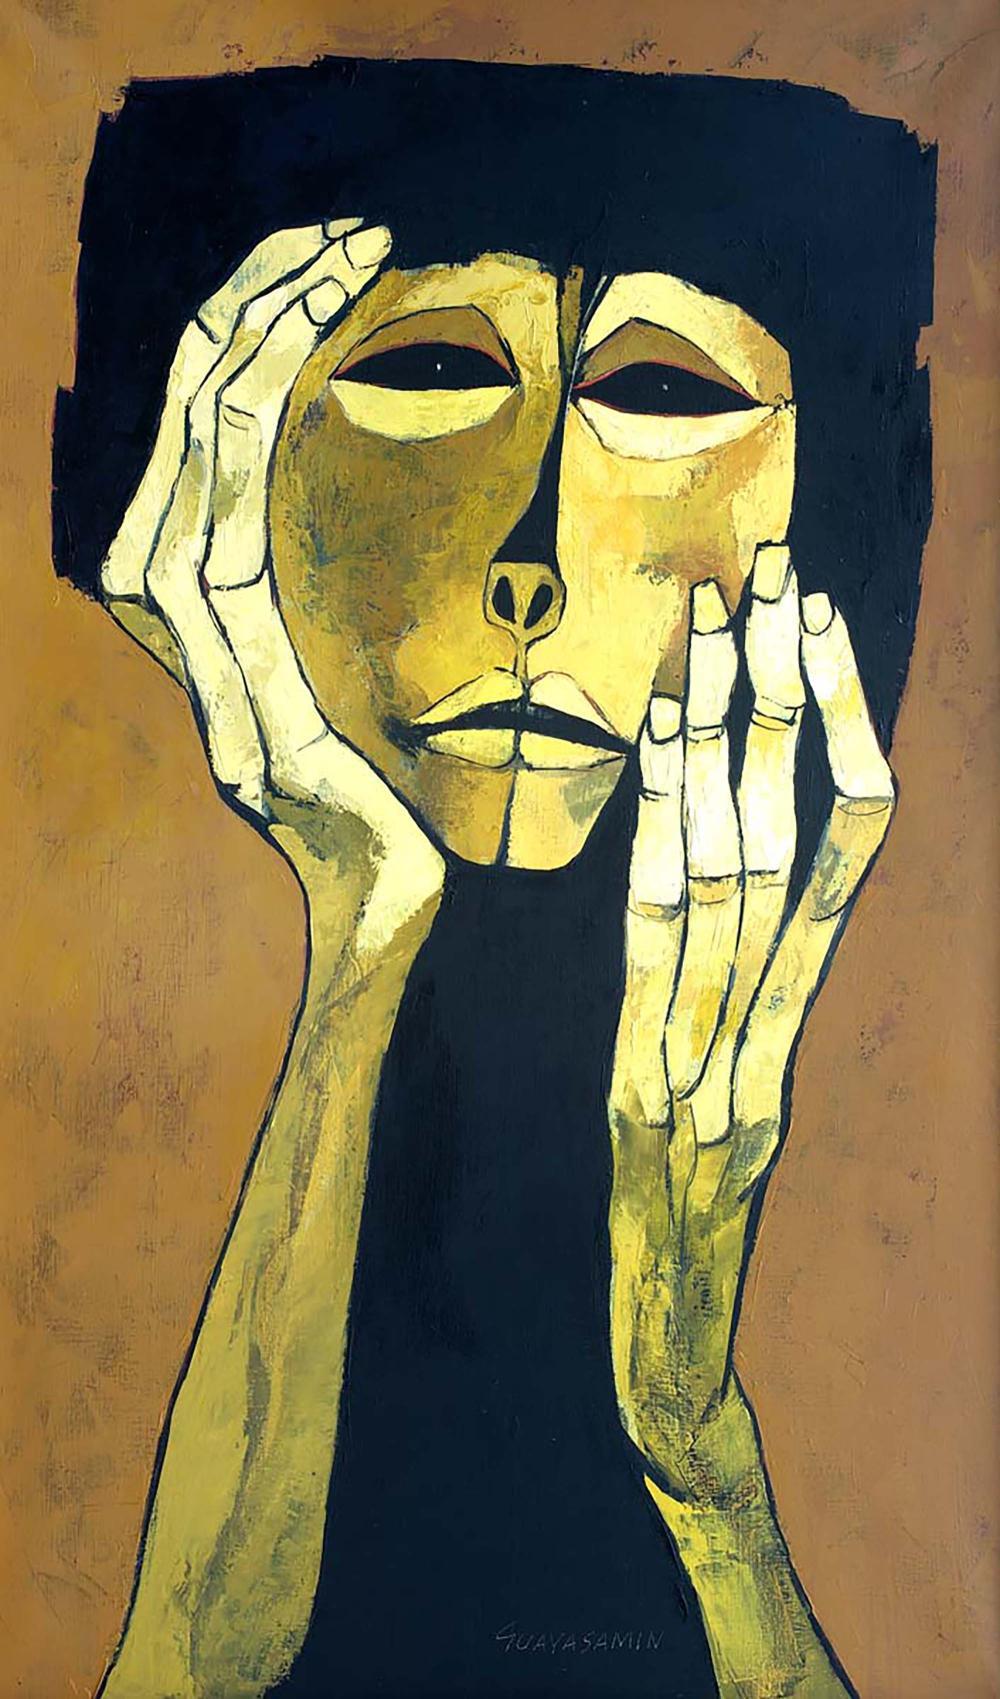 Tenue D Artiste Peintre oswaldo guayasamin, ecole equatorienne (1919-1999) « ternura